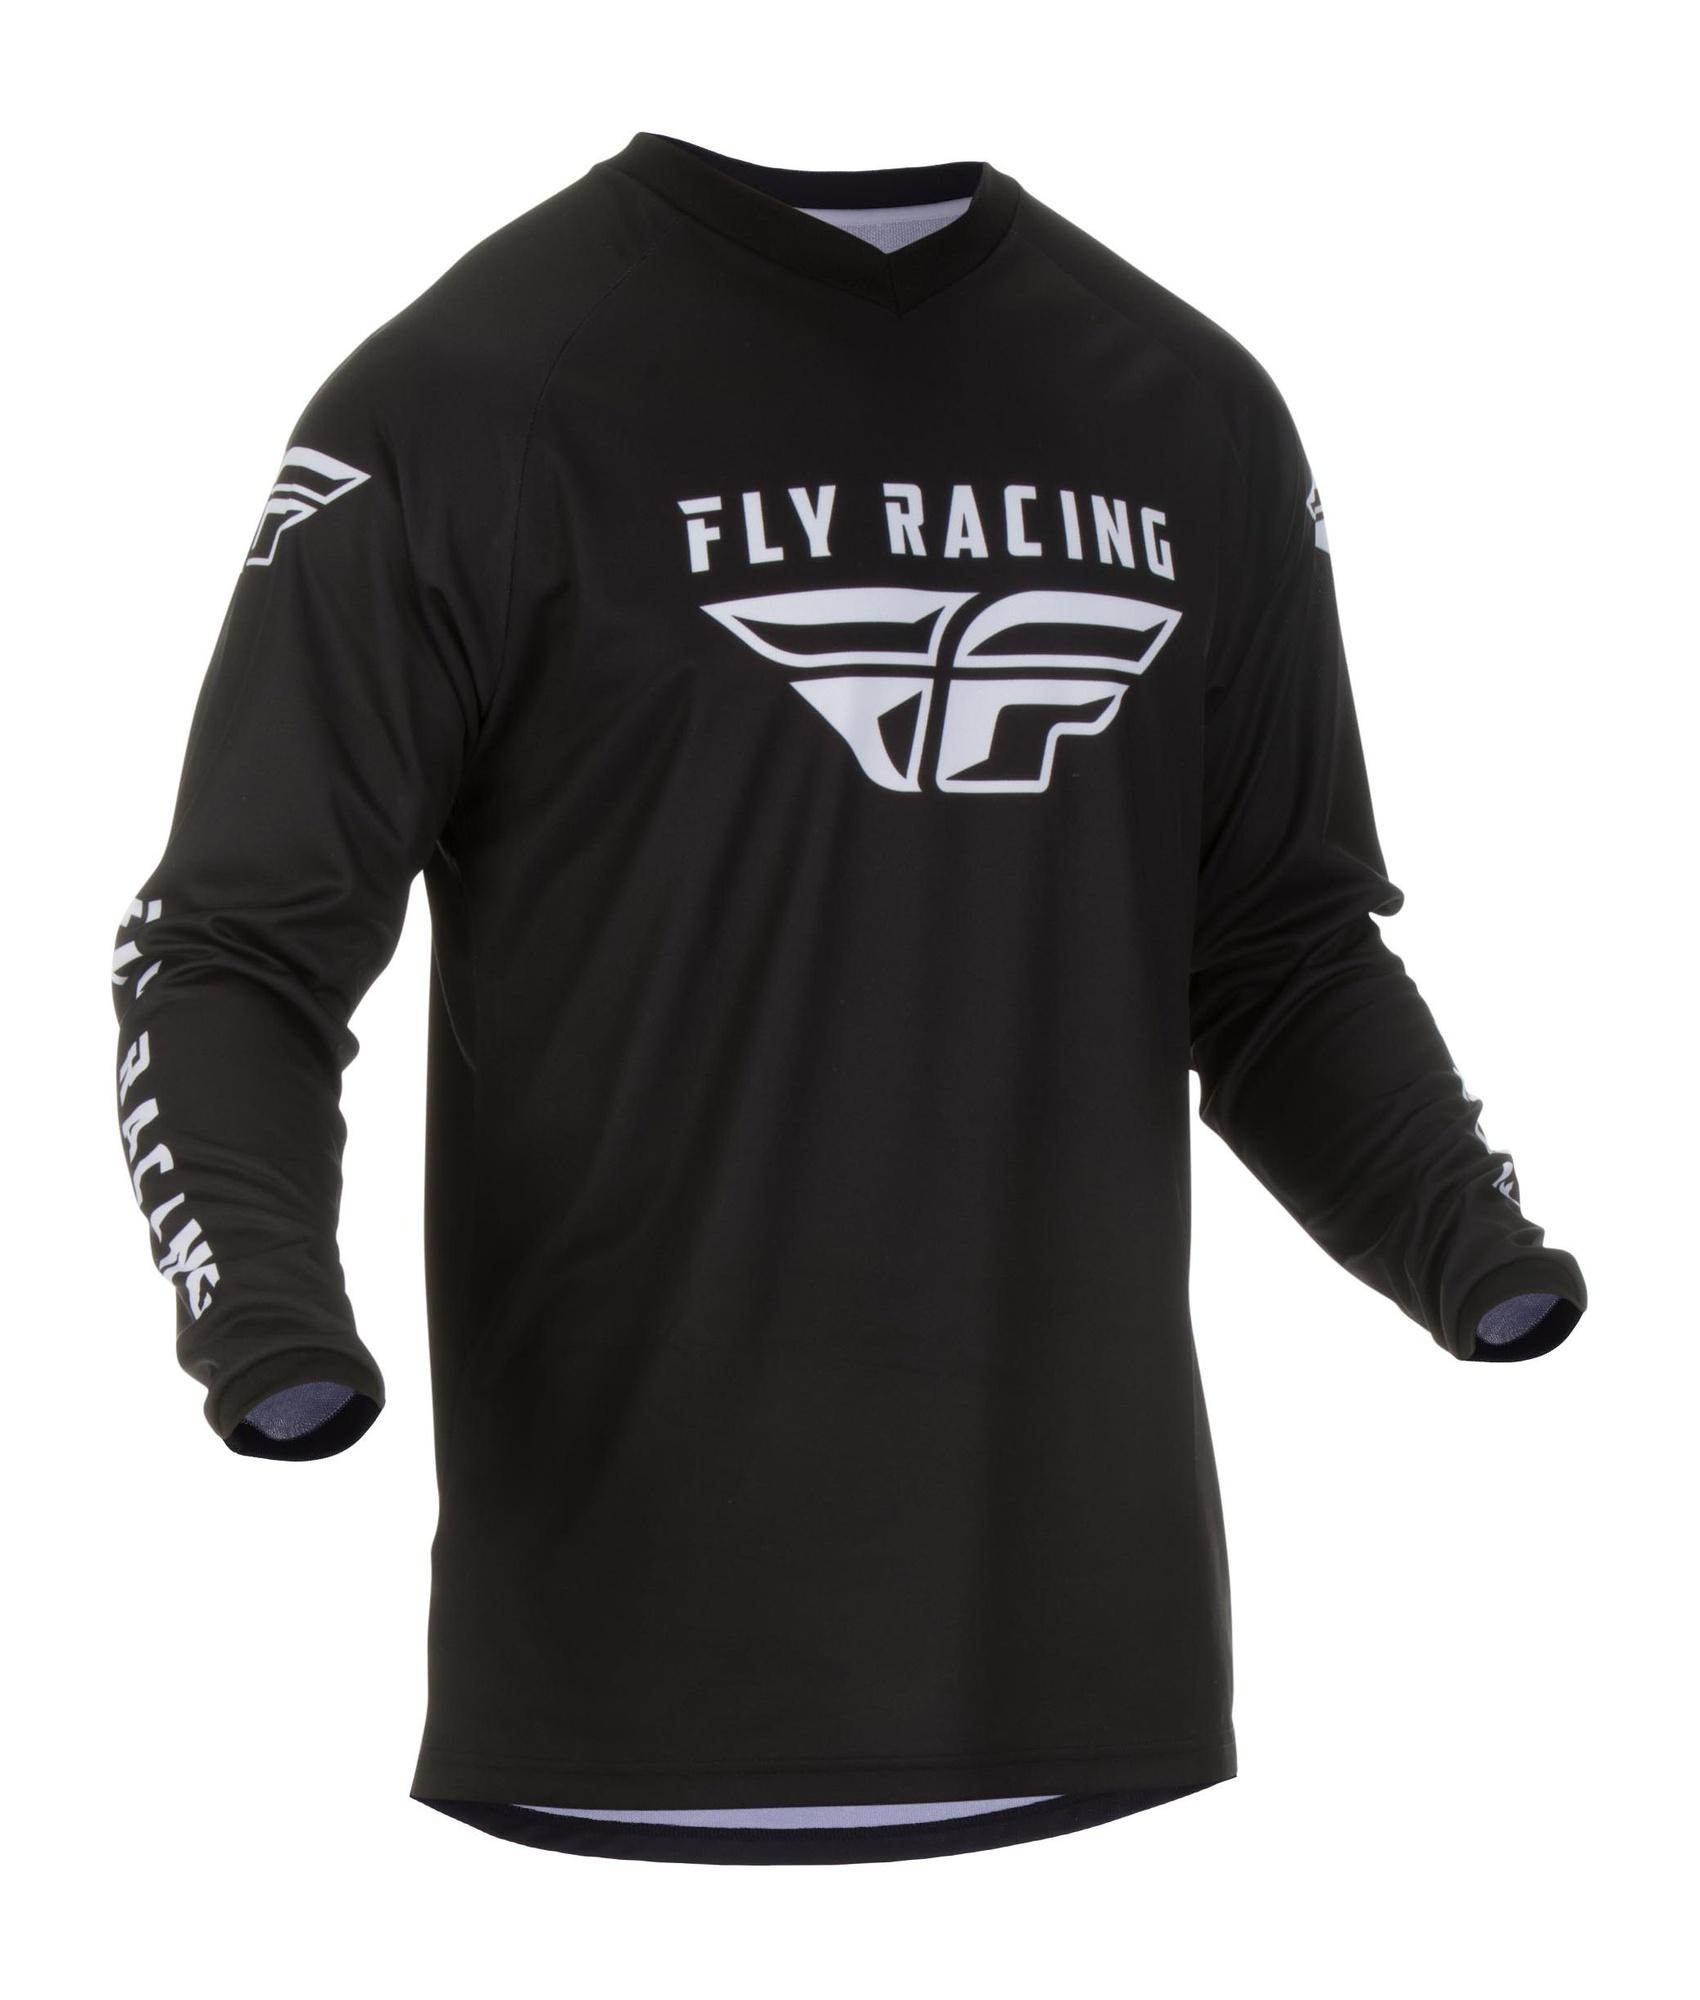 Dres Fly racing Universal černá S moto adamek